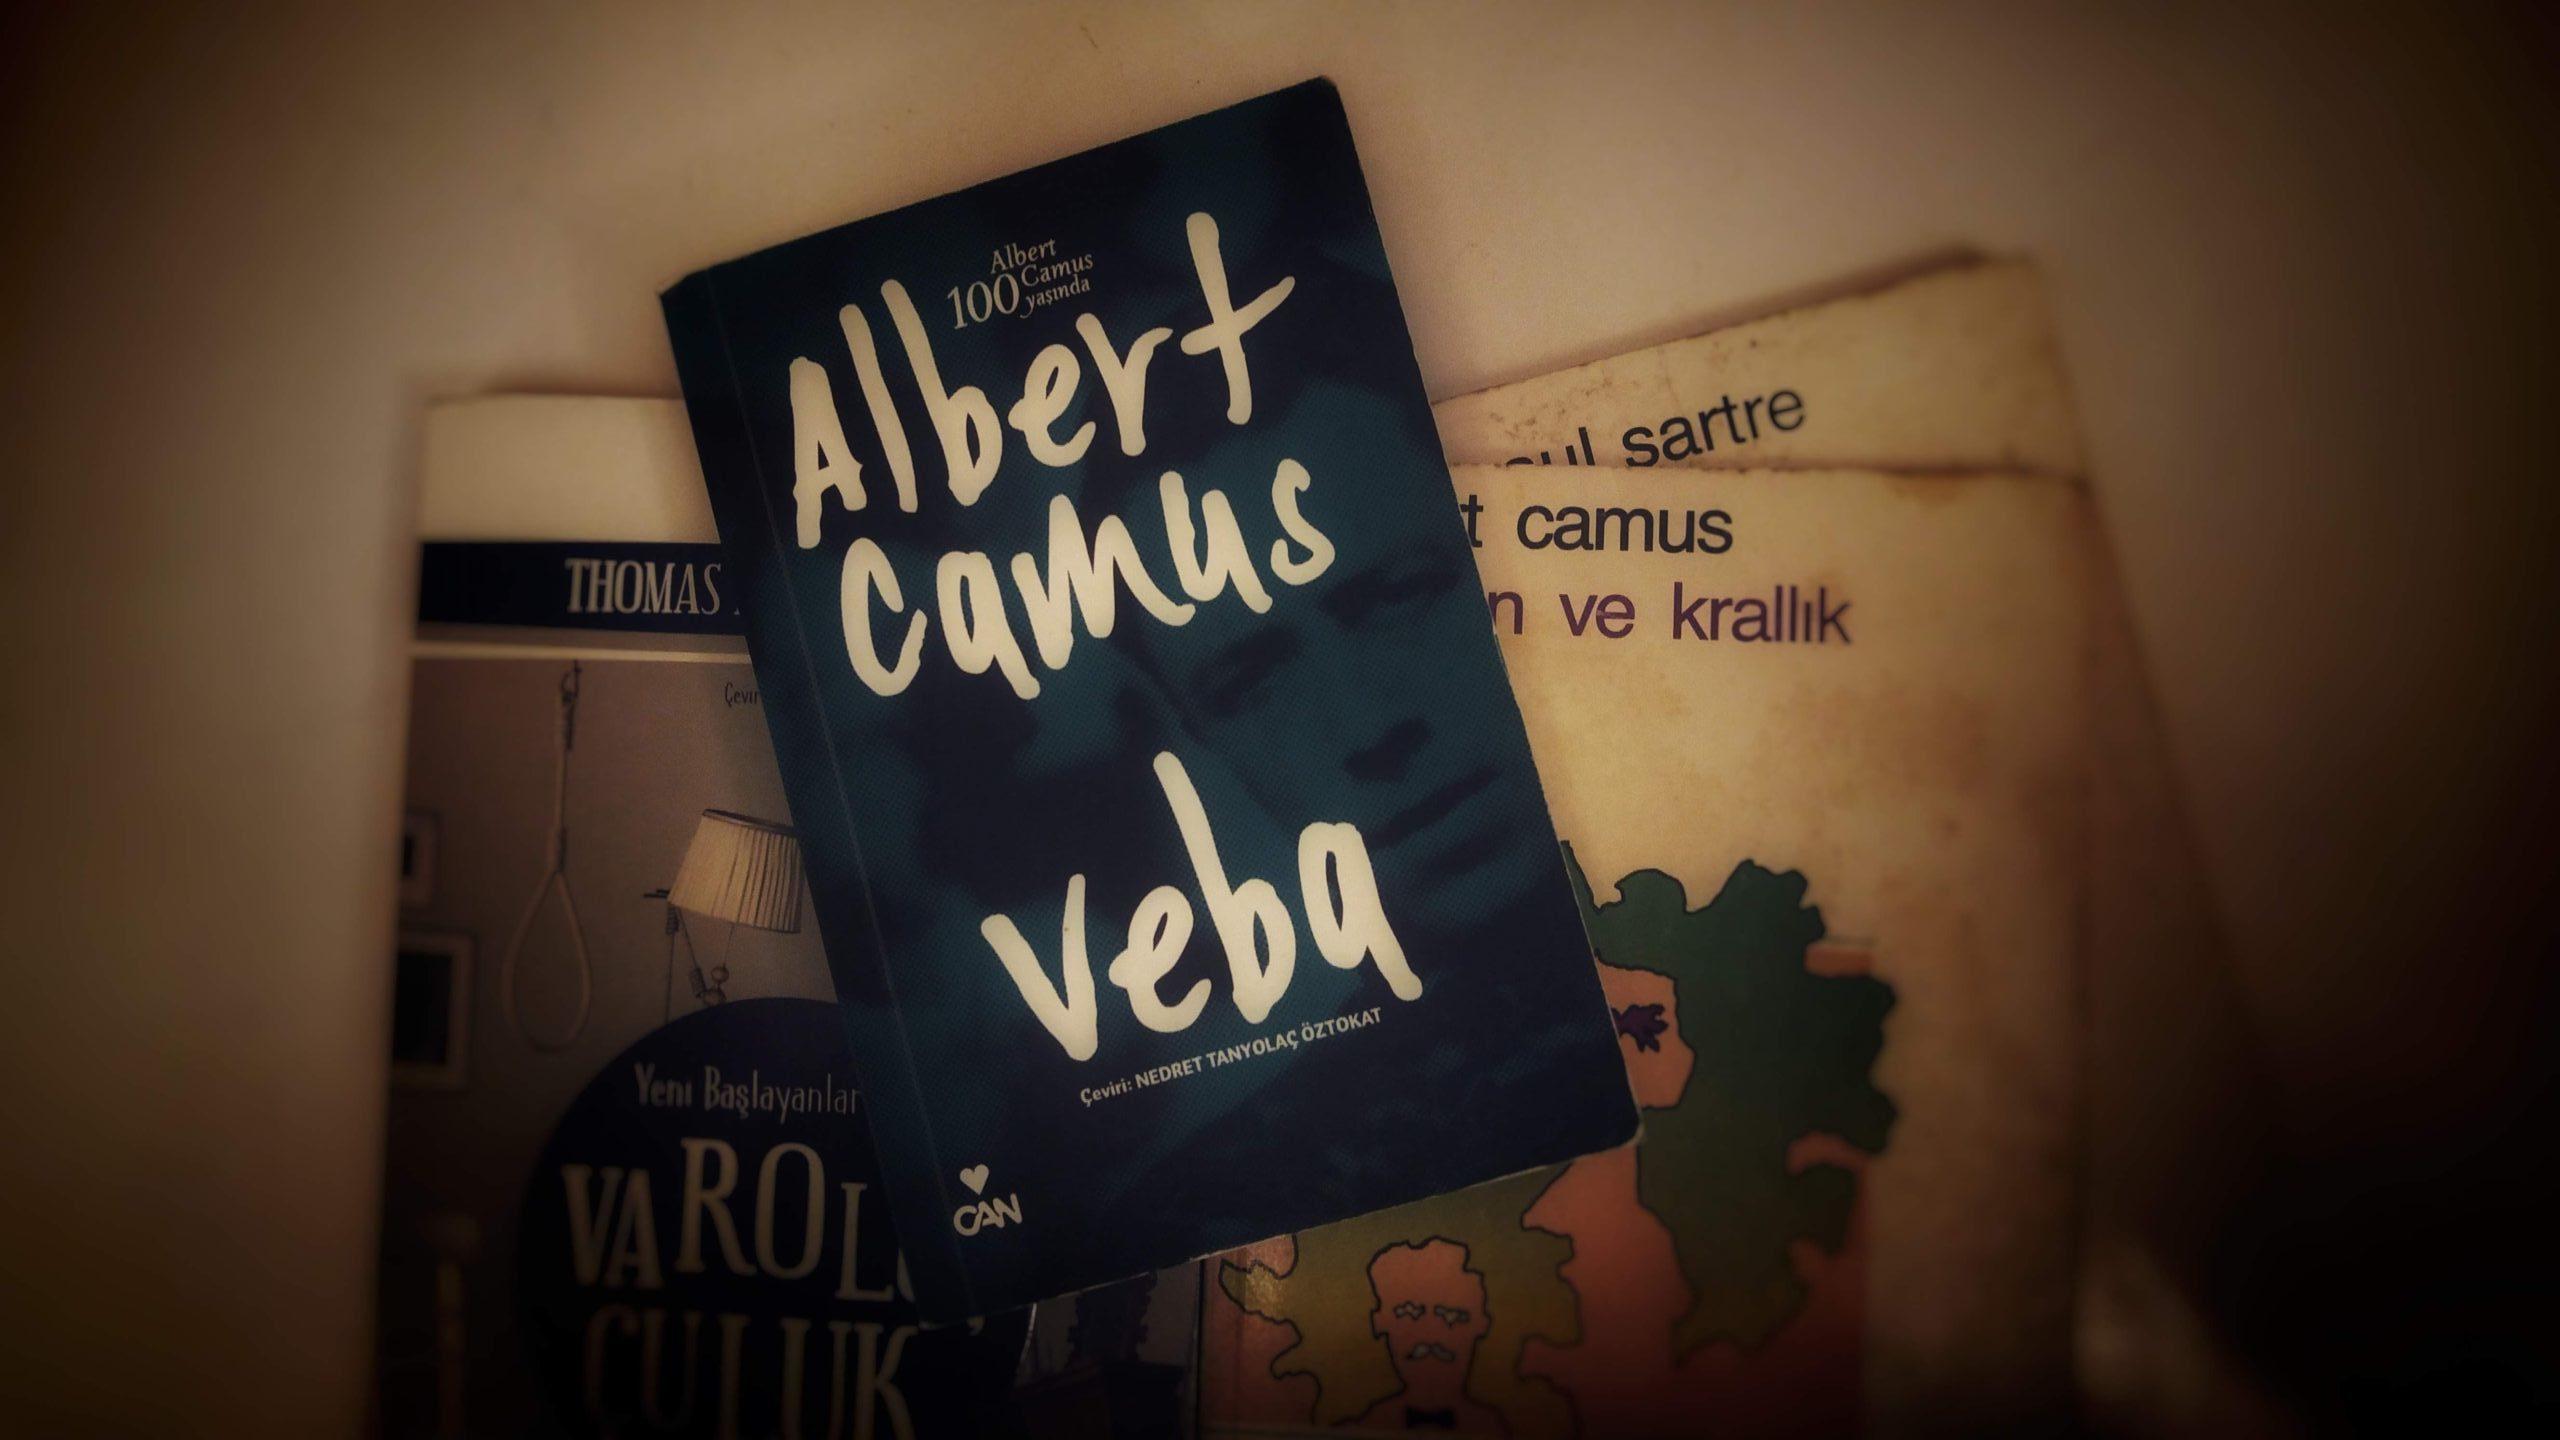 ALBERT CAMUS / Veba